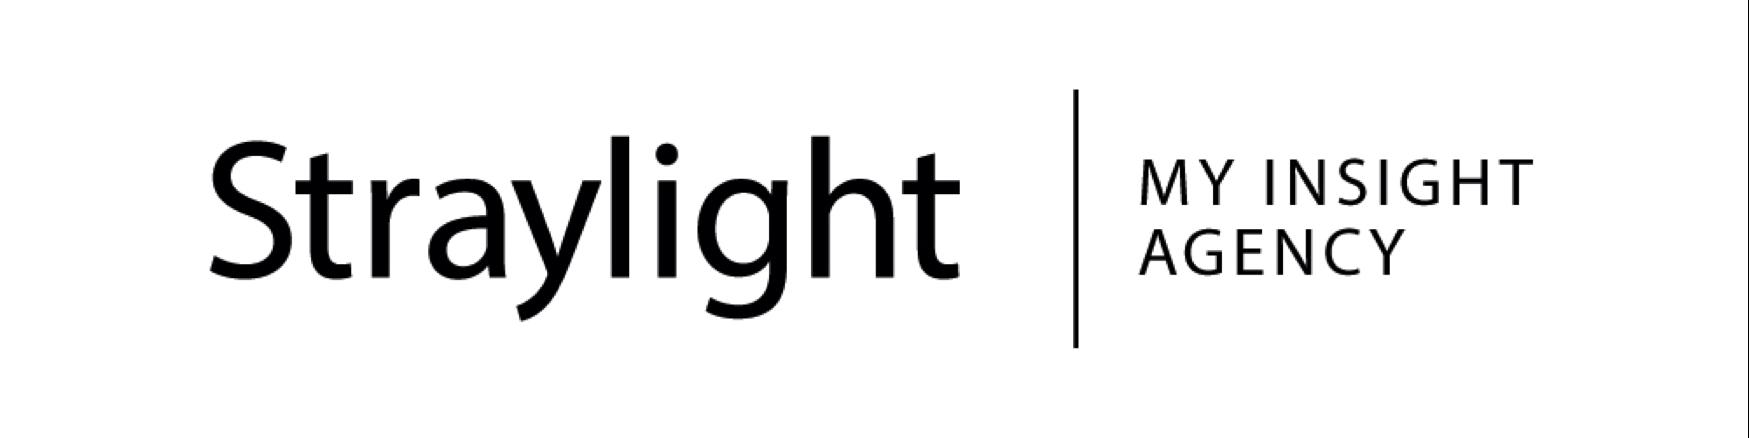 Straylight